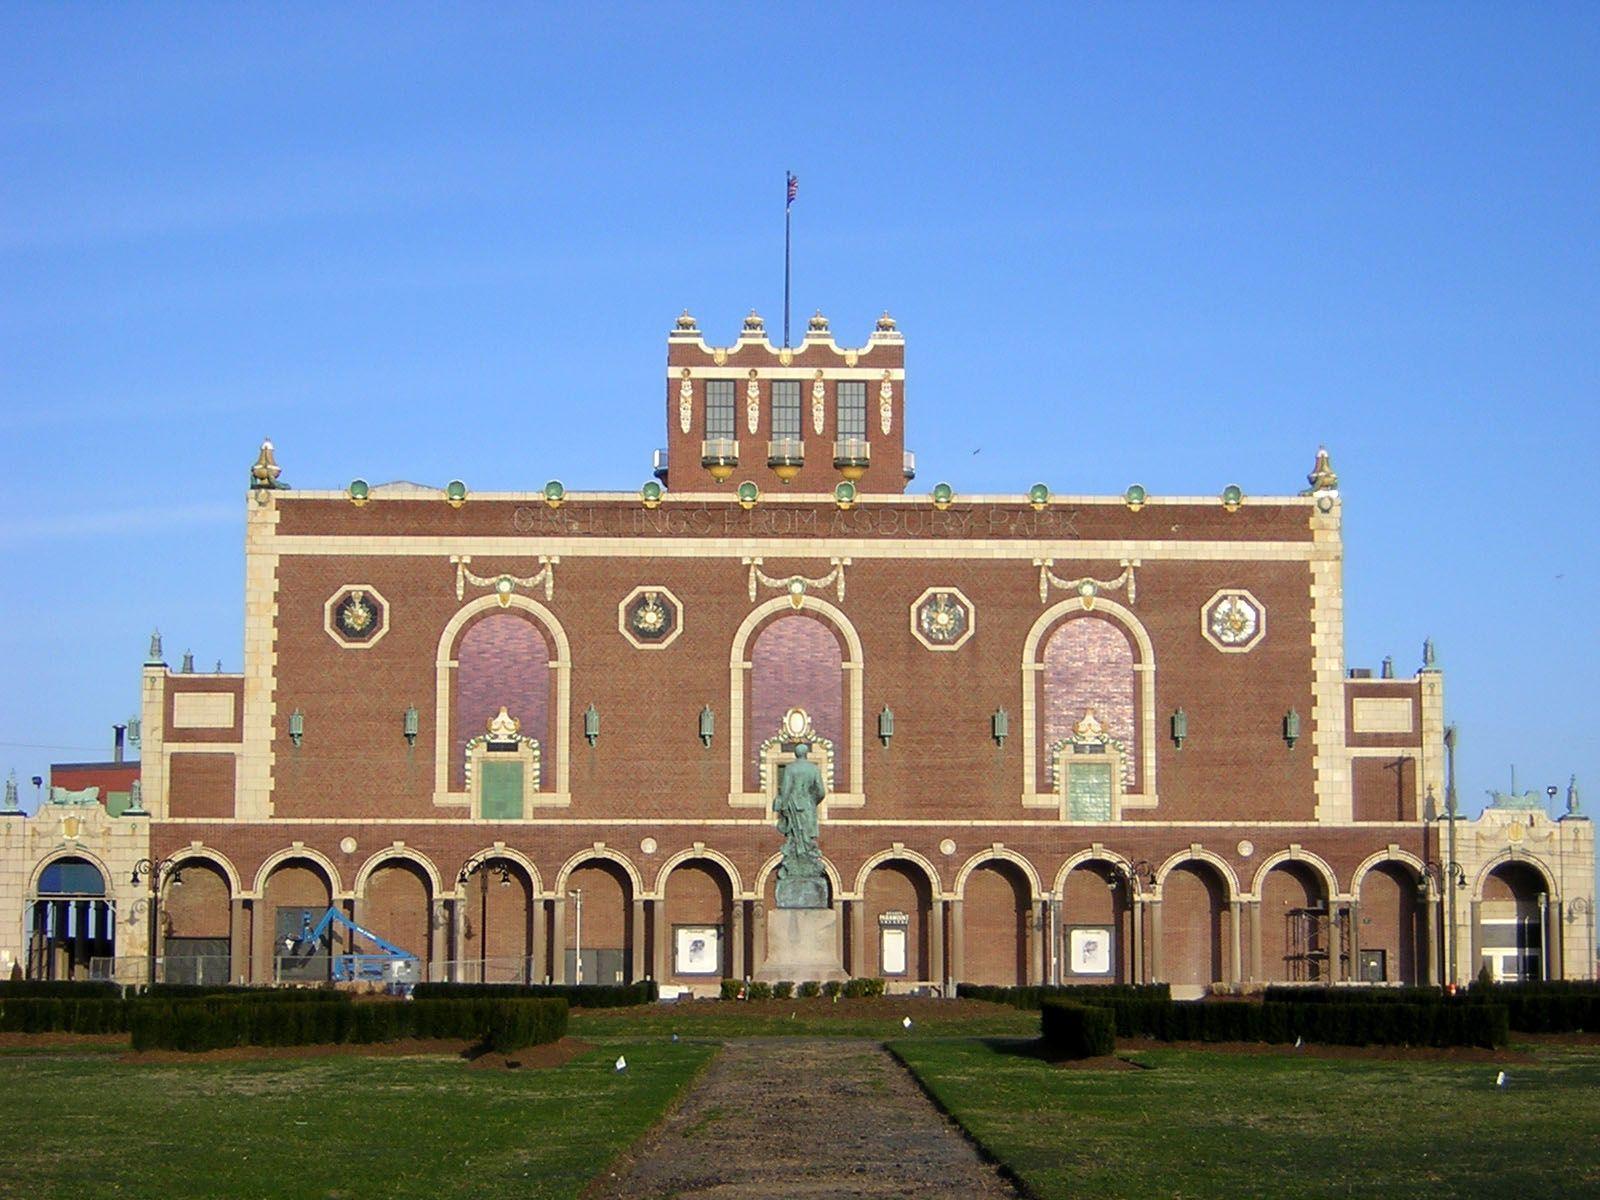 Asbury Park NJ Convention Hall Asbury Park